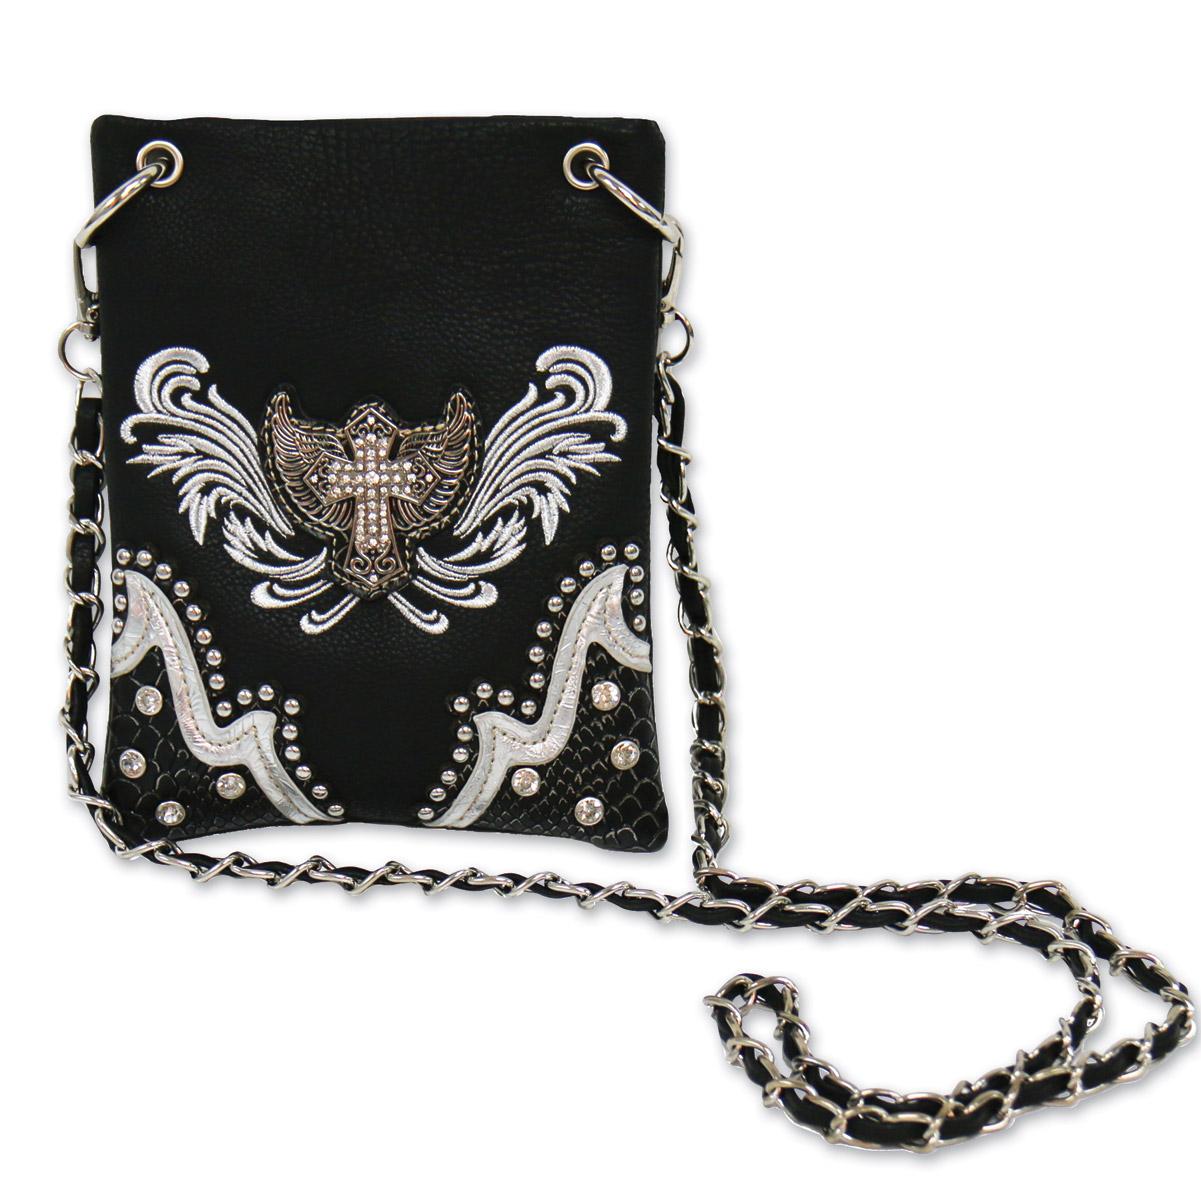 Hot Leathers Silver Cross Emblem Black/Silver Purse